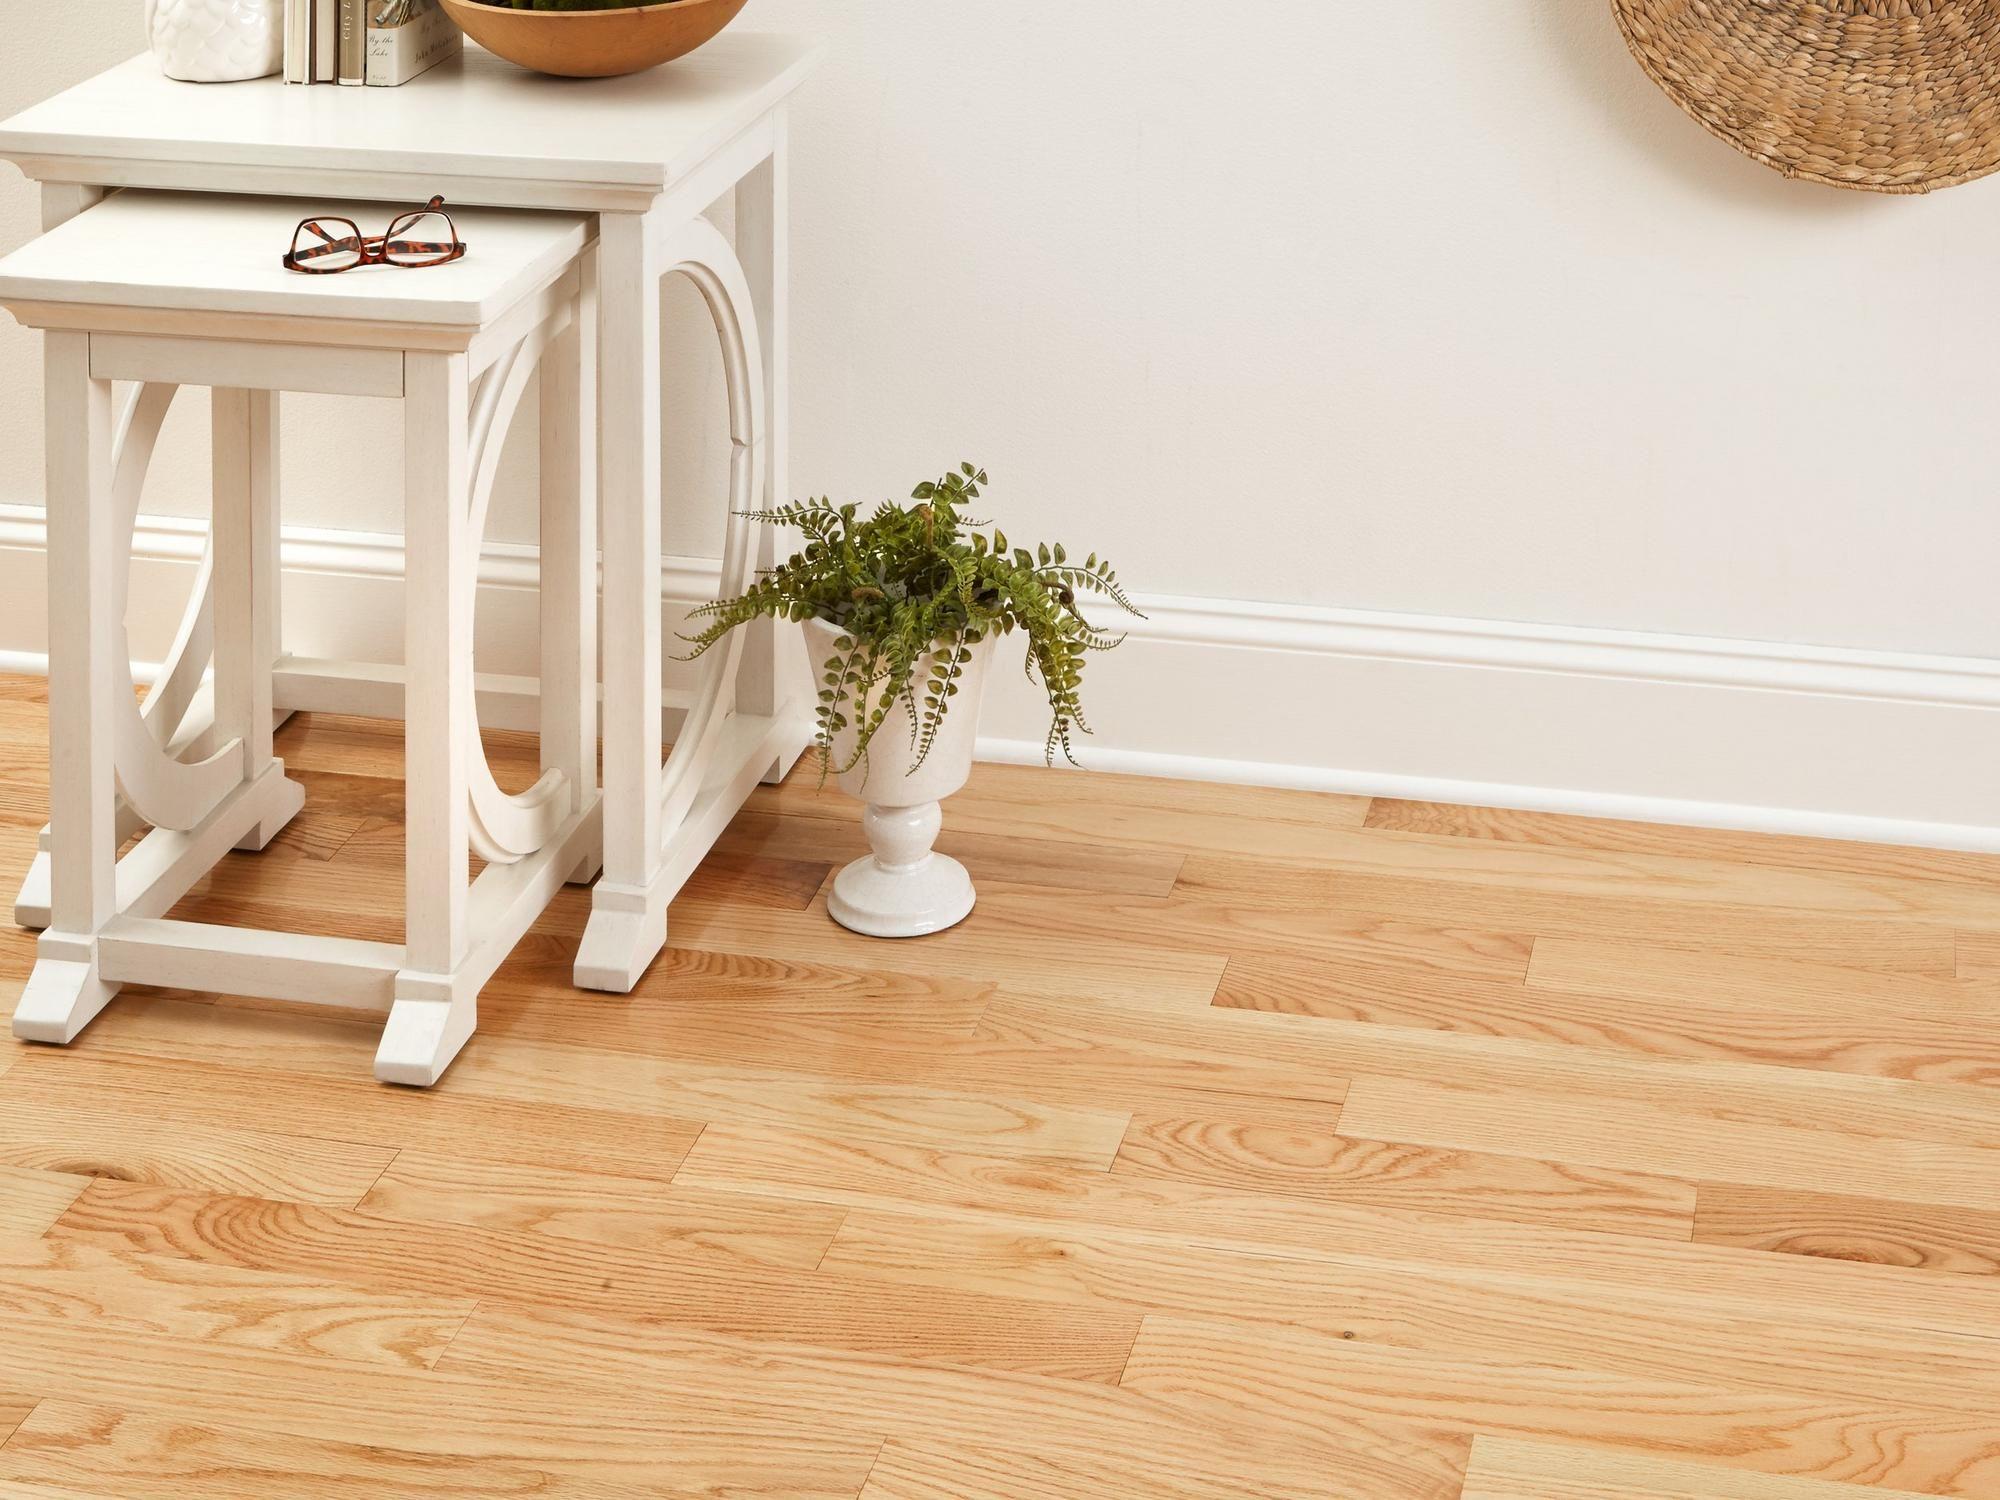 Natural Select Oak High Gloss Solid Hardwood Solid Hardwood Floors Solid Hardwood Hardwood Floors